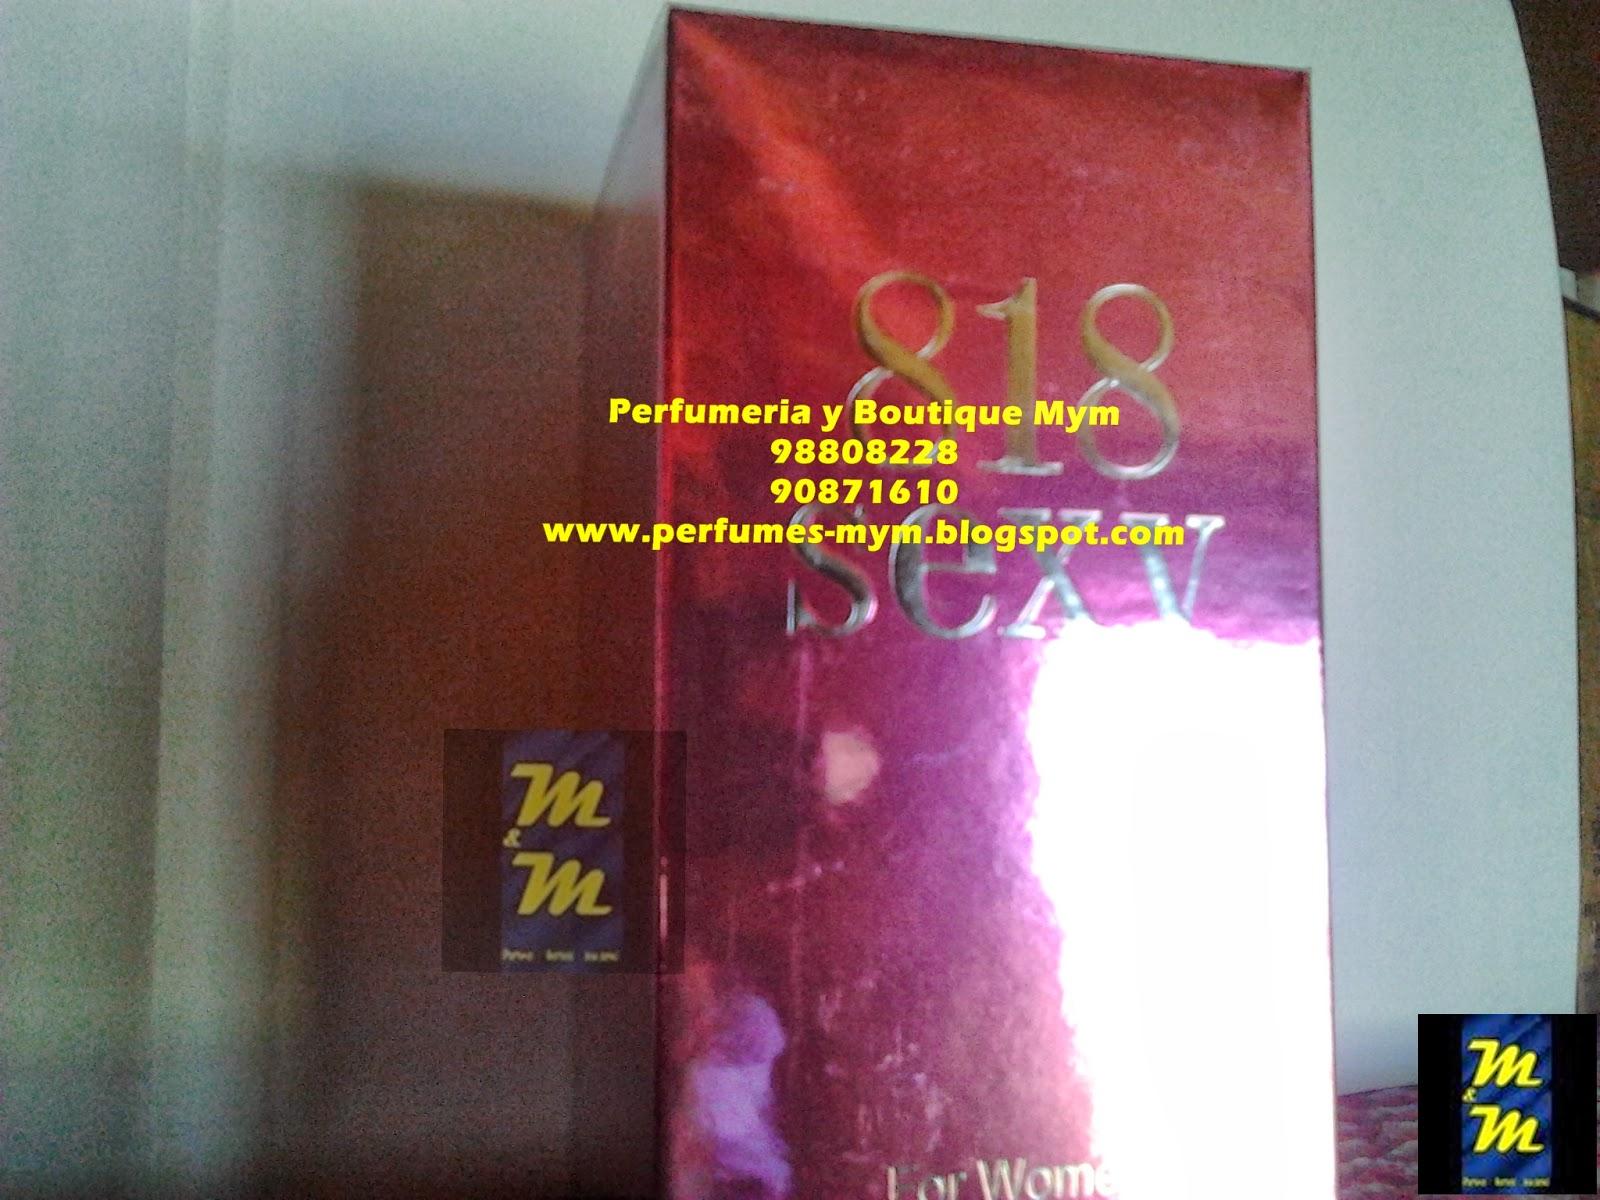 PERFUME 818 SEXY PARA MUJERES